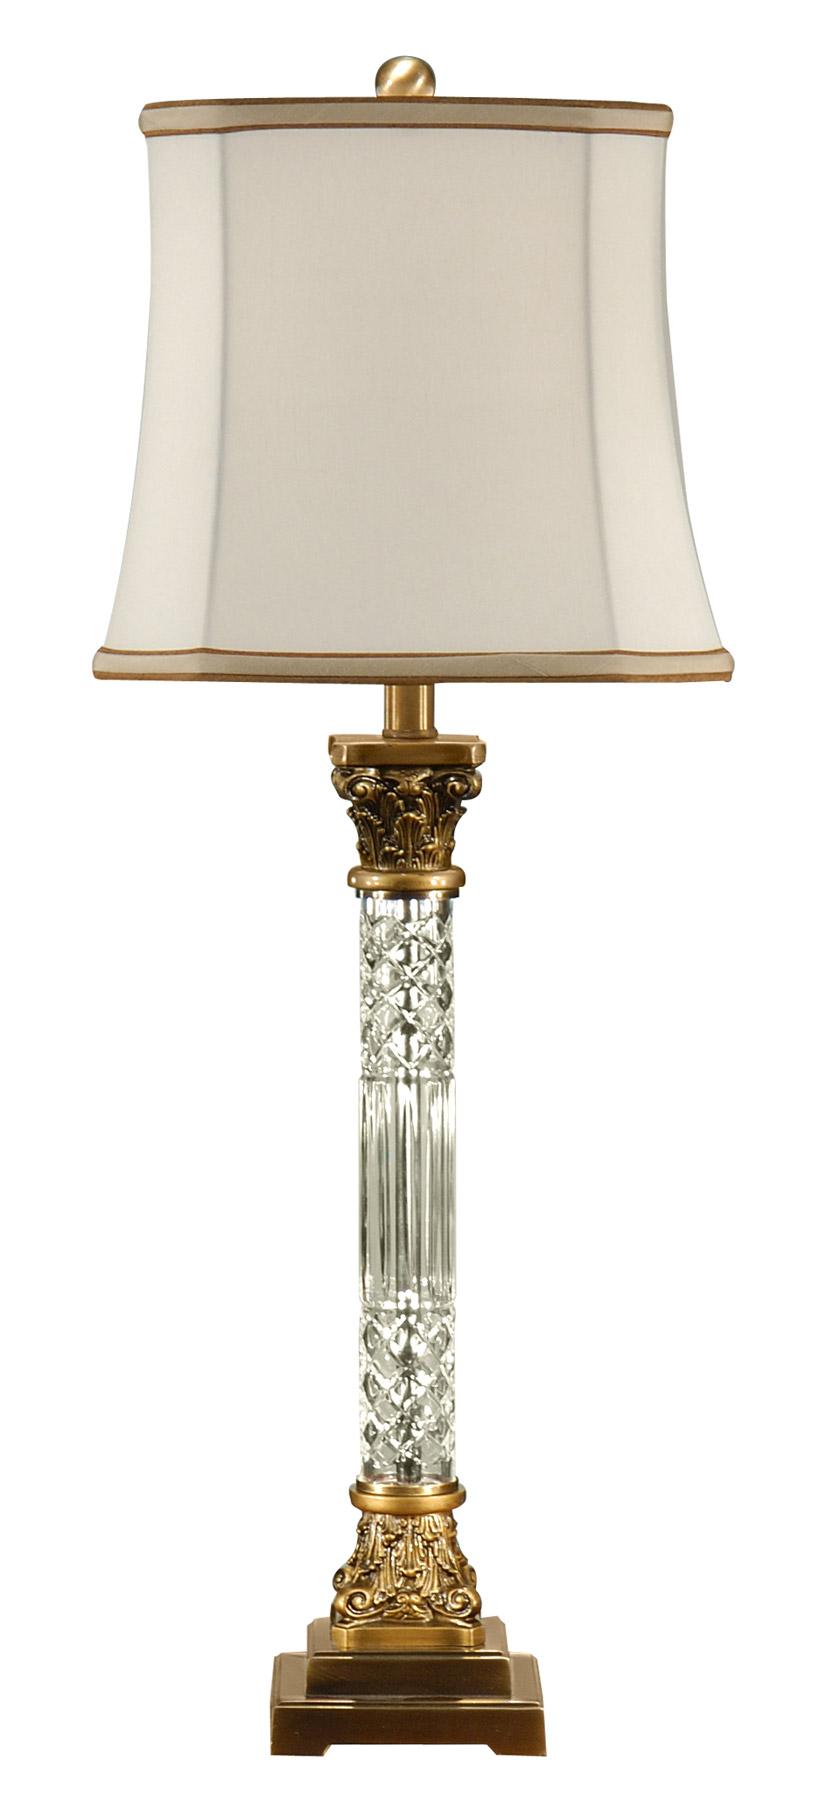 Wildwood 46655 crystal crystal column table lamp view larger image aloadofball Choice Image